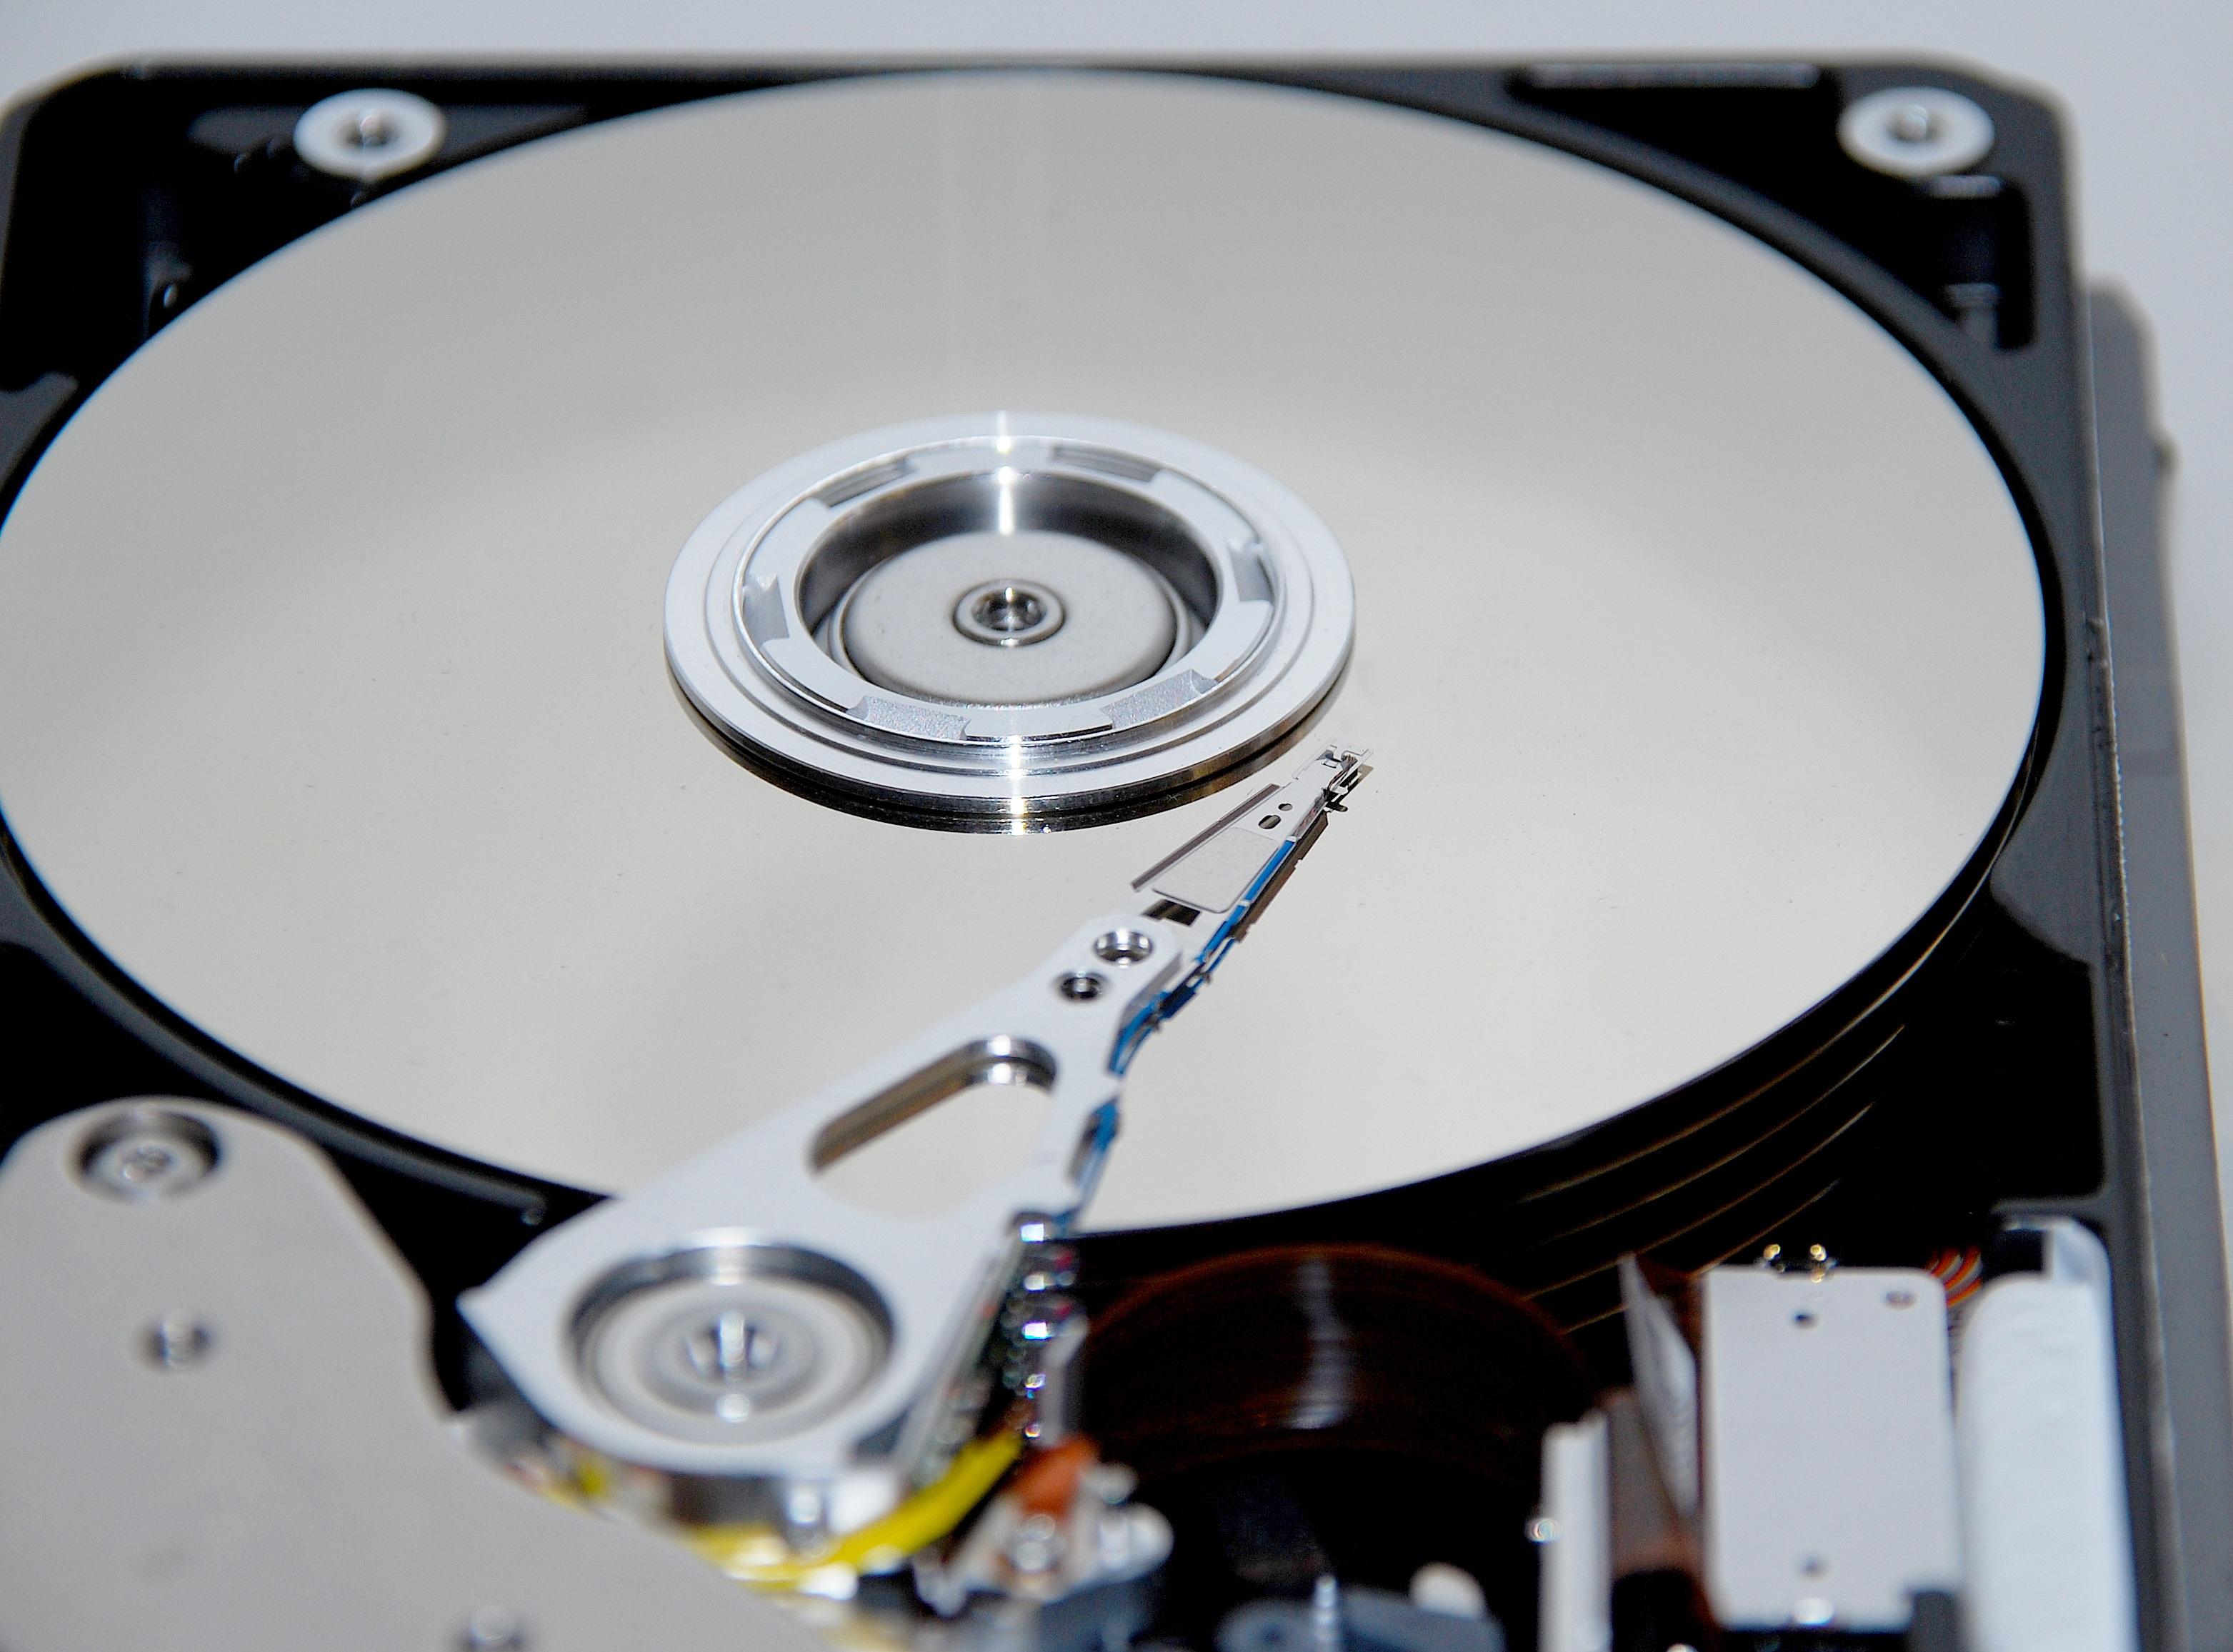 fotos gratis   tecnolog u00eda  rueda  aguja  componente